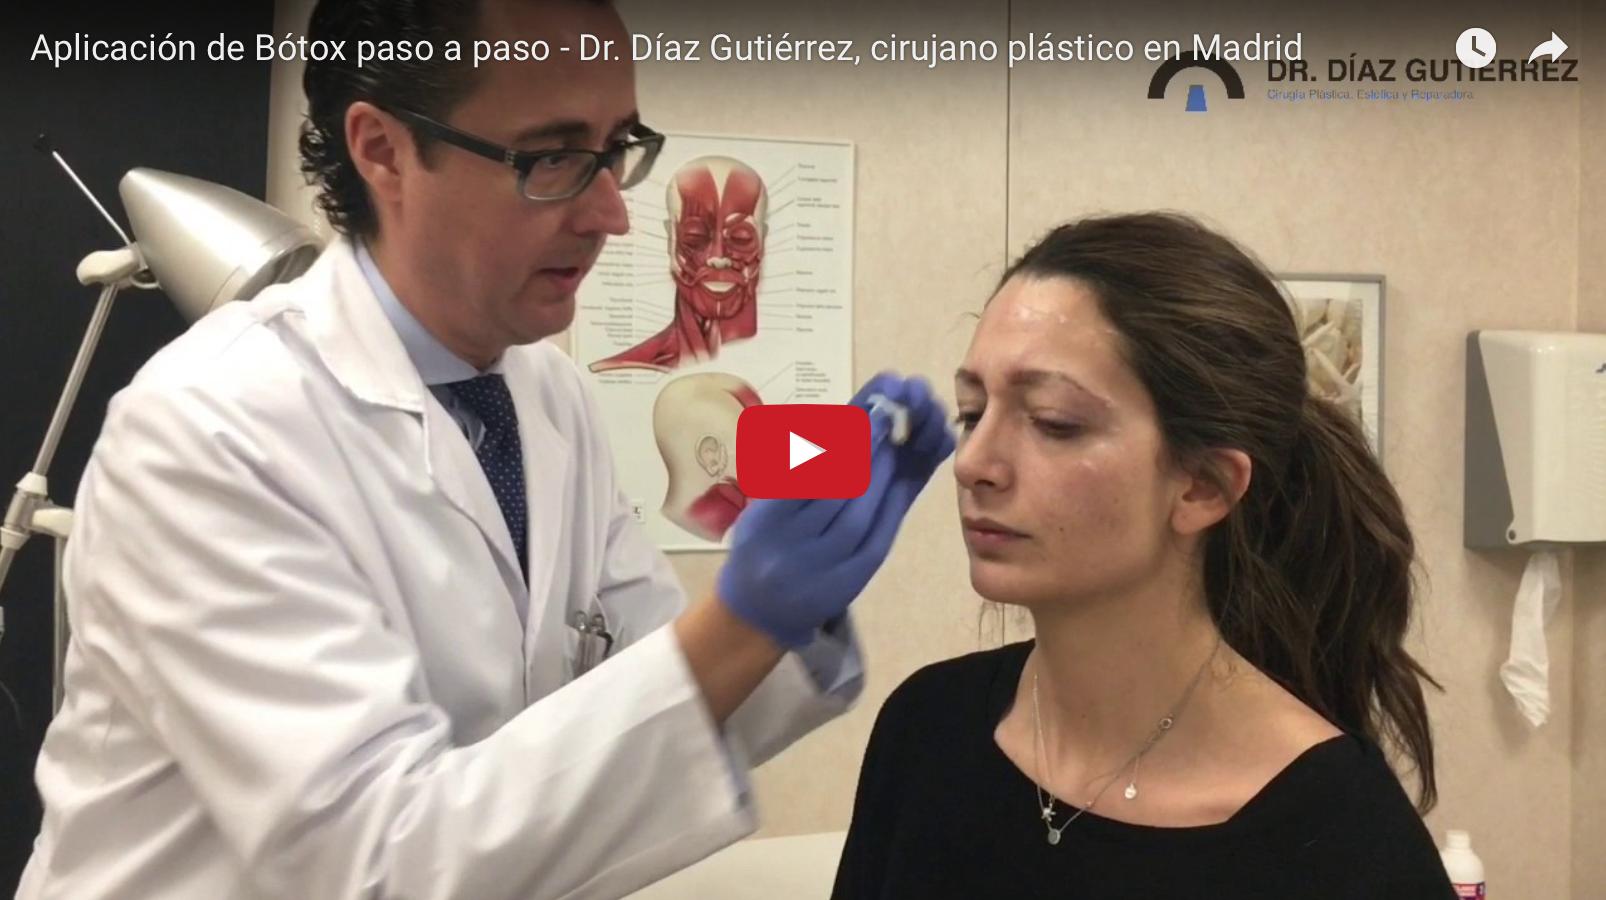 aplicación-botox-preventivo-cirujano-plastico